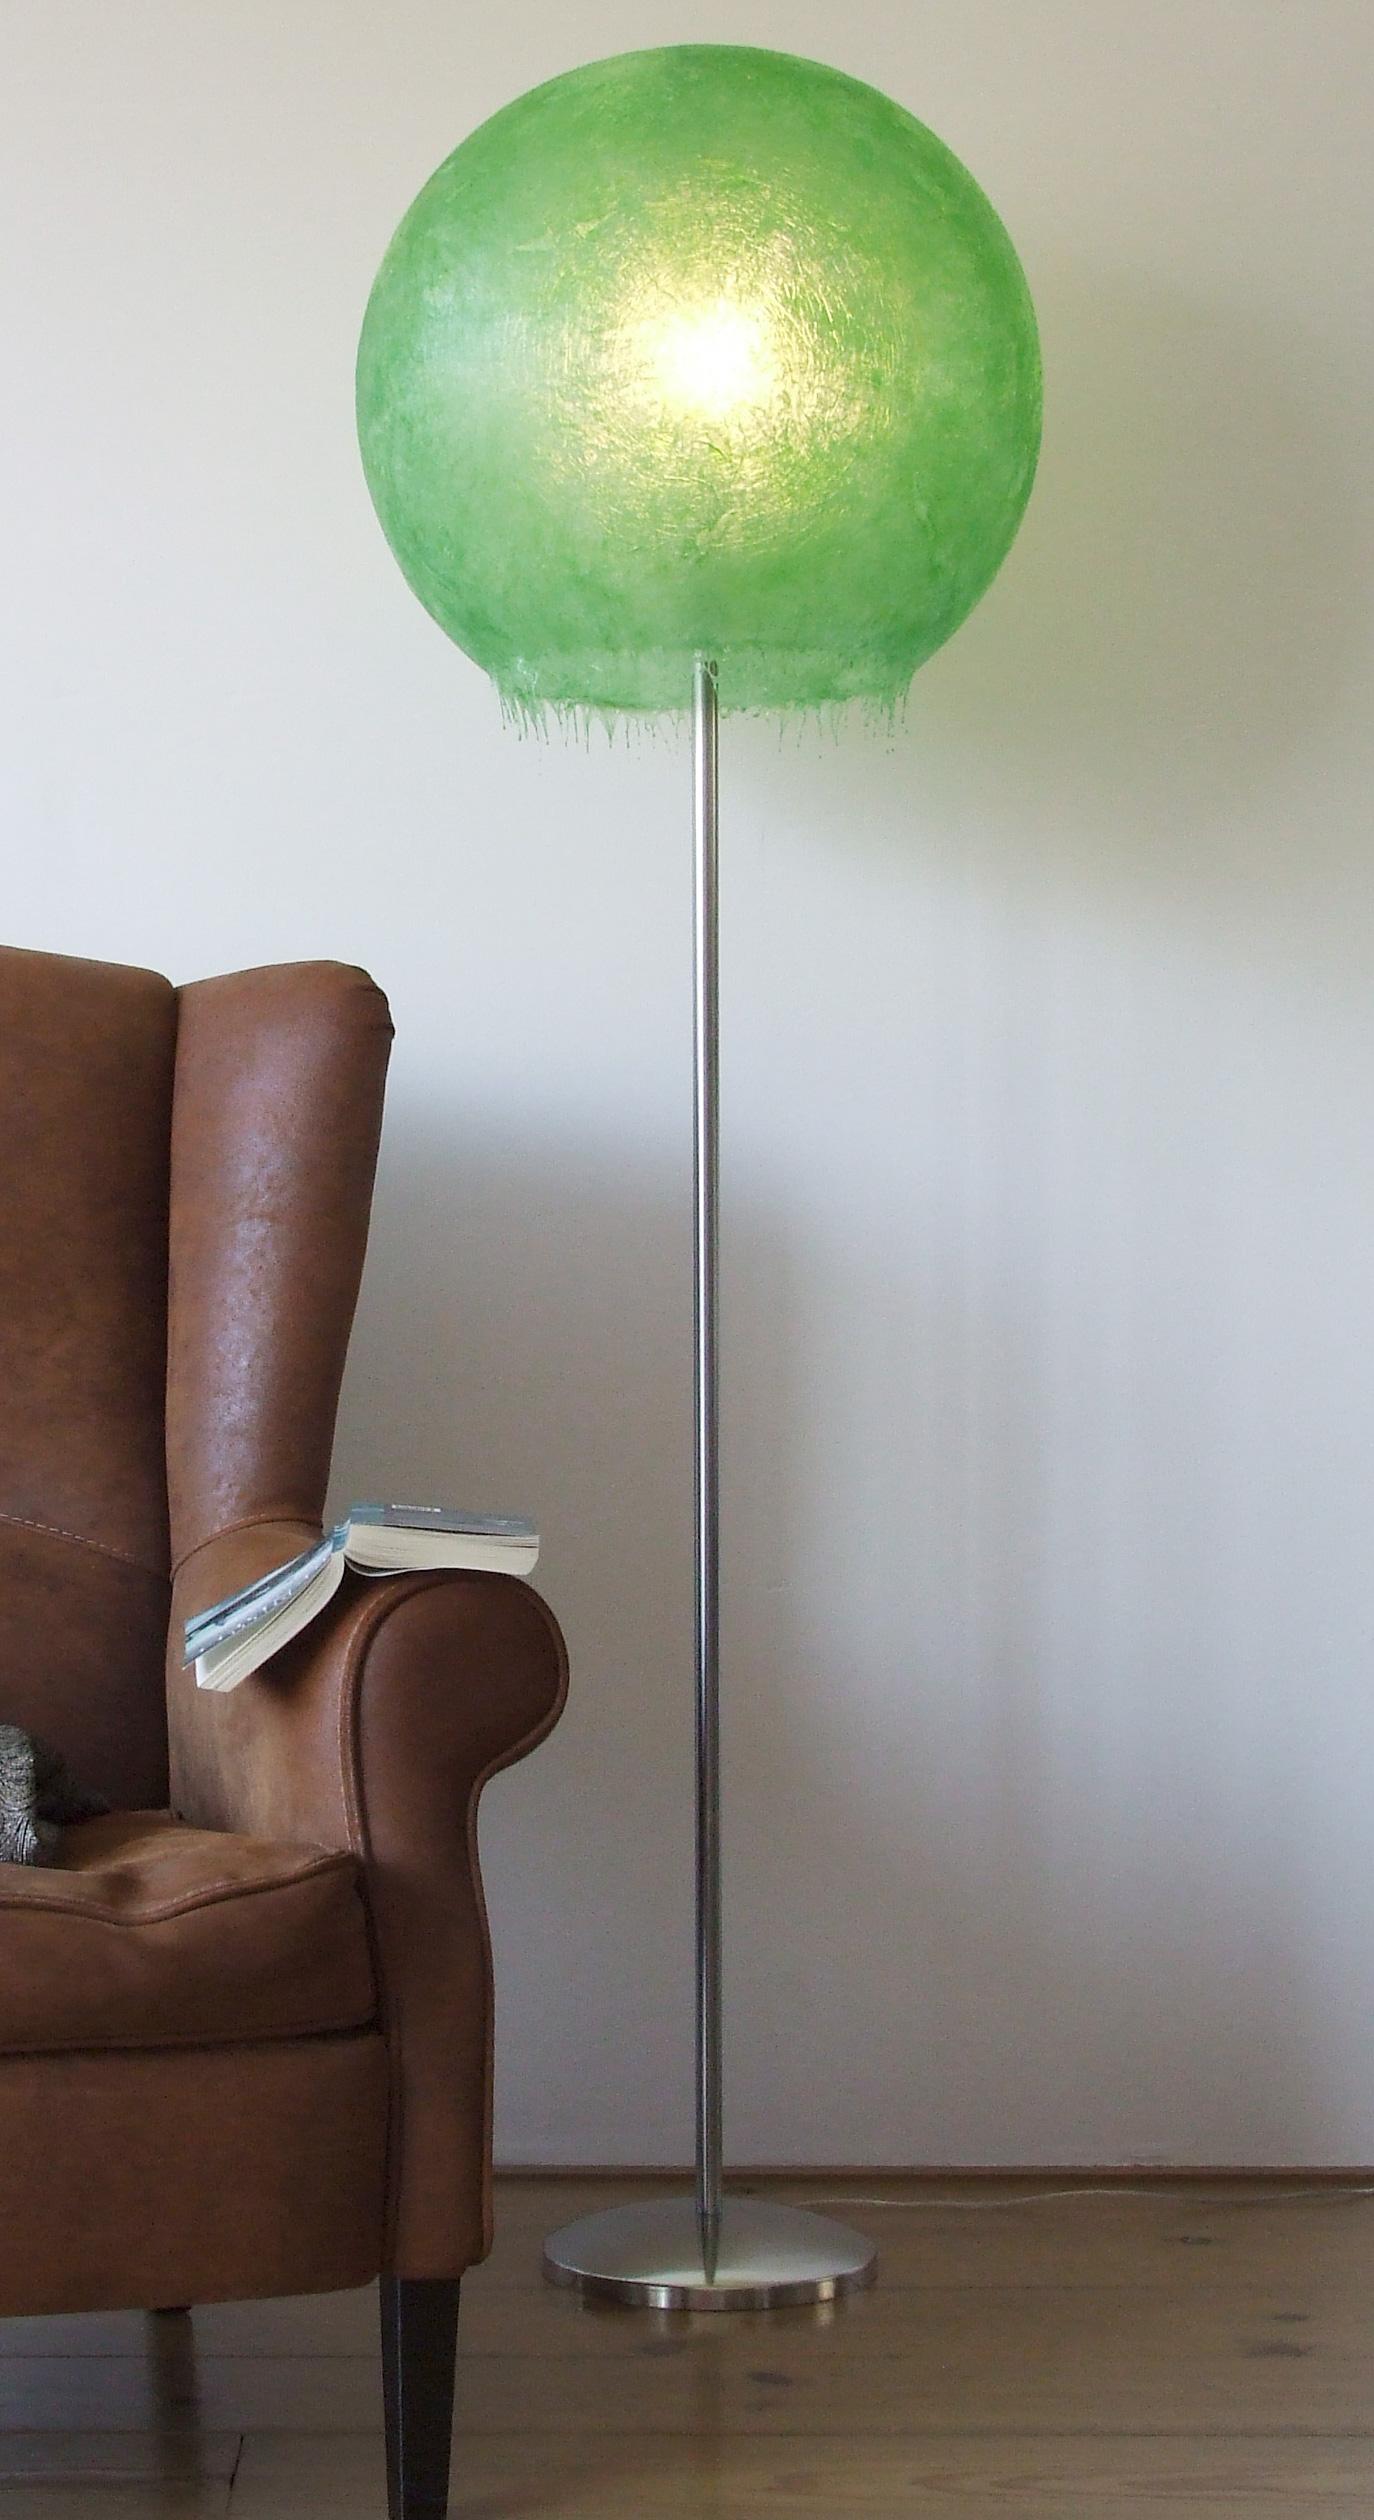 staande groene maanlamp with lampen staand. Black Bedroom Furniture Sets. Home Design Ideas